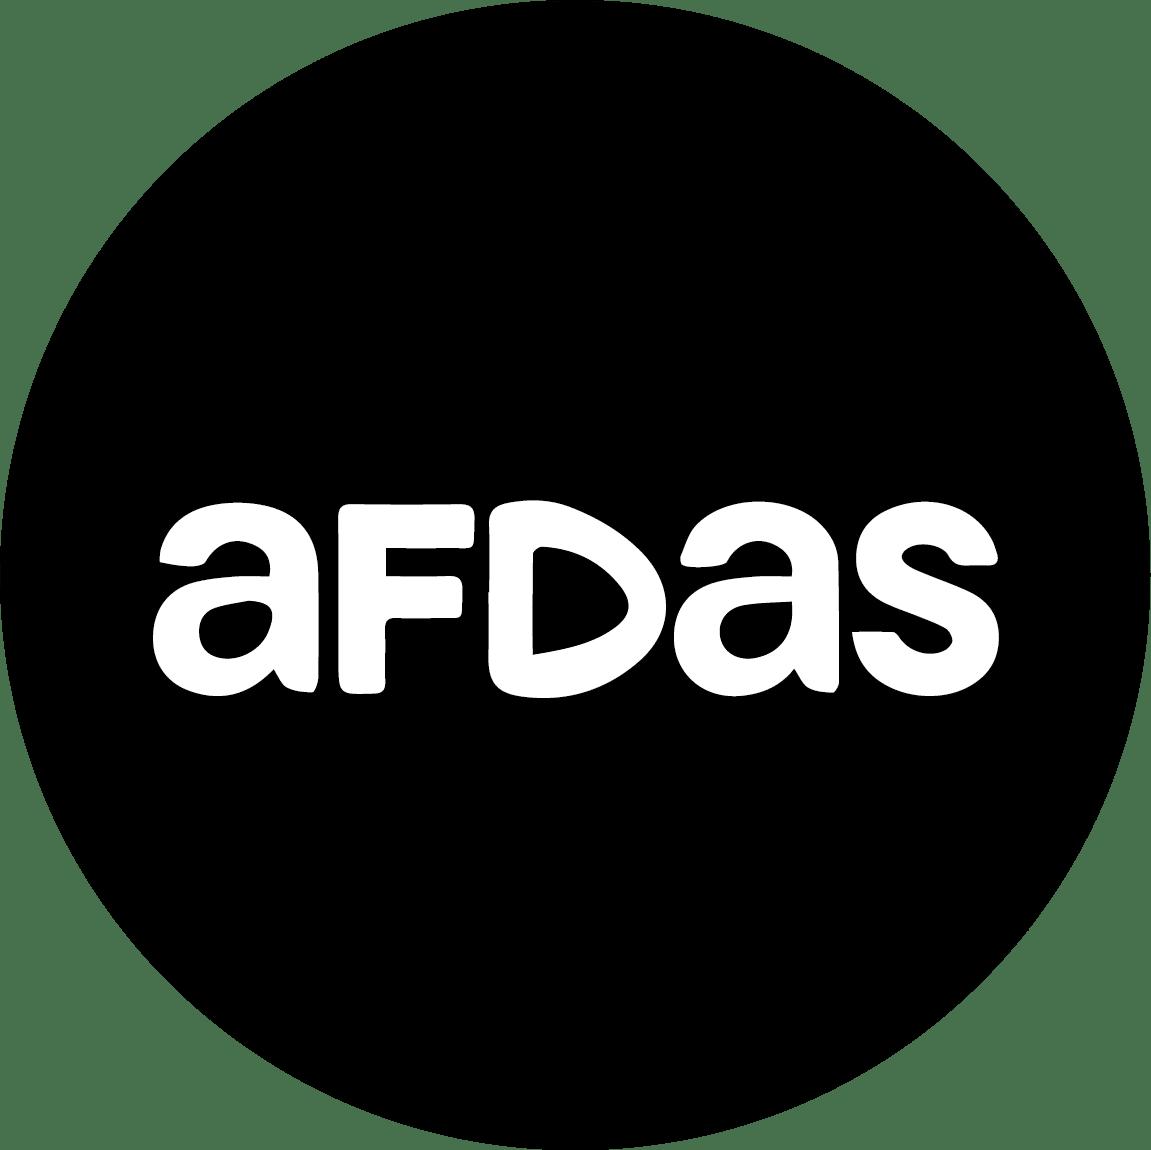 https://www.audiosculture.fr/wp-content/uploads/2021/05/AFDAS.png